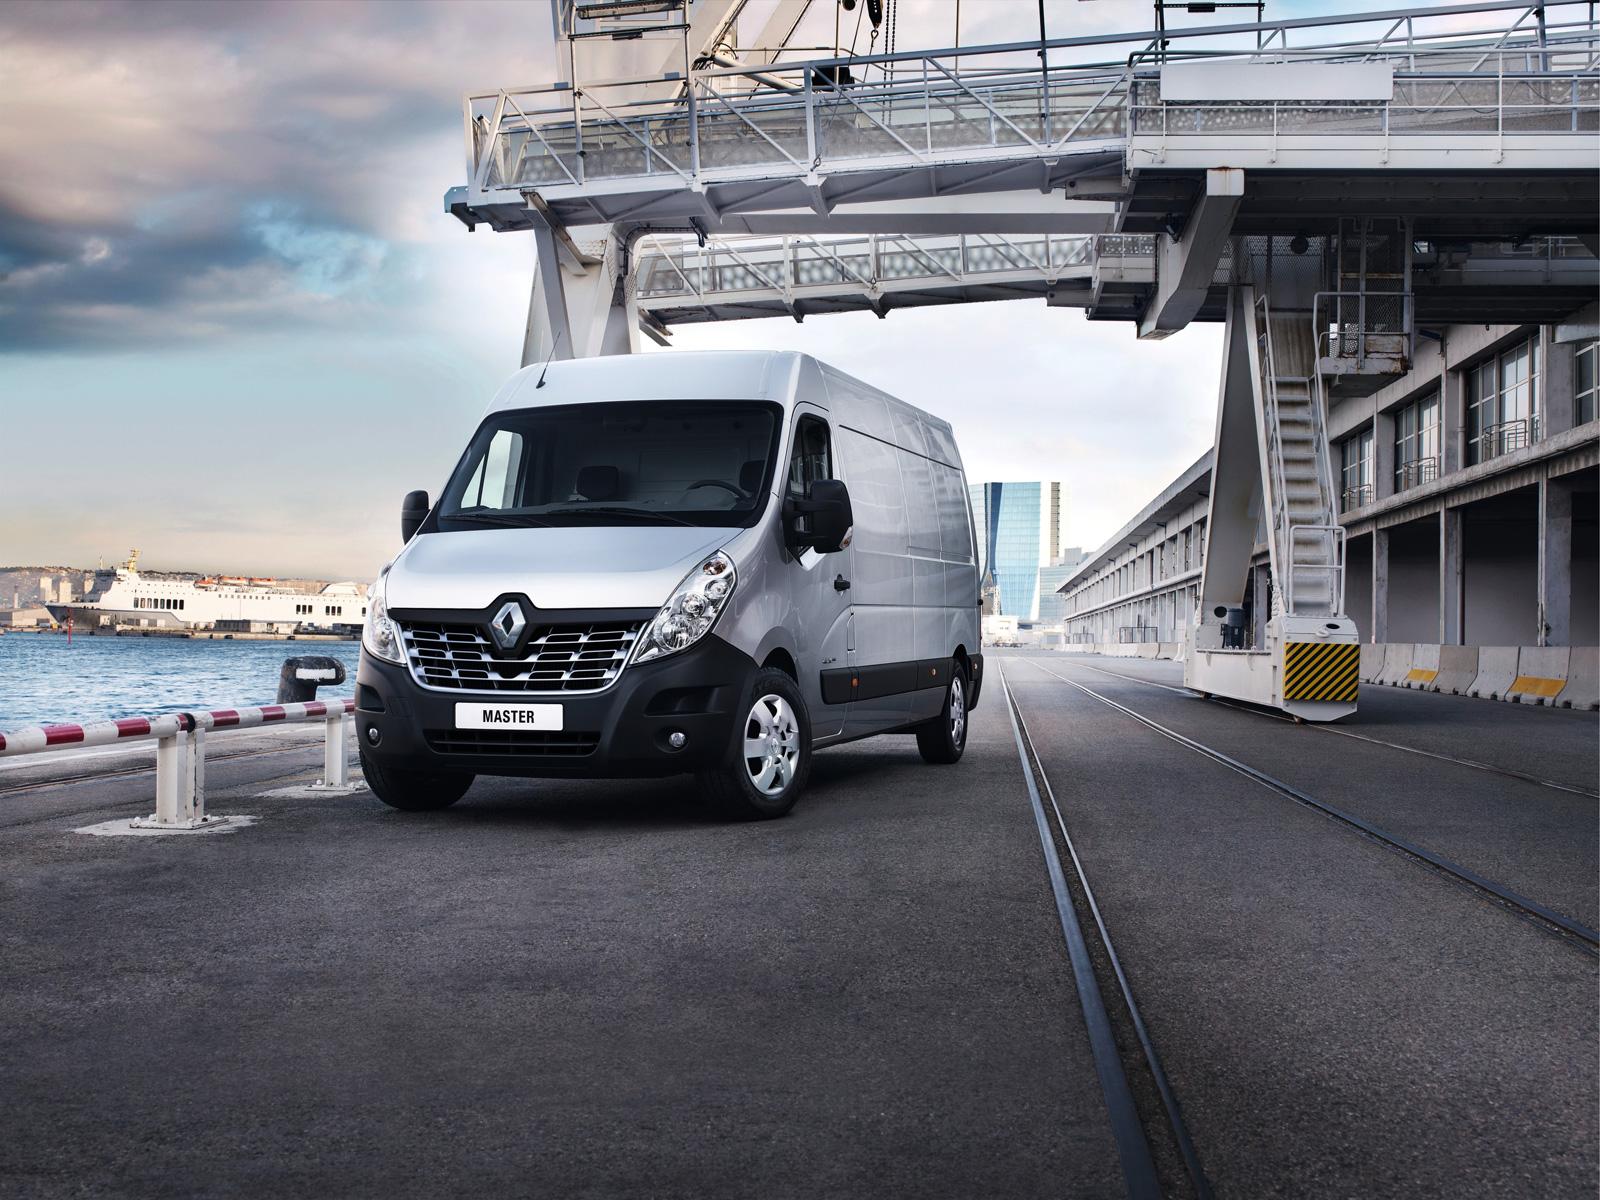 Renault_57214_global_fr